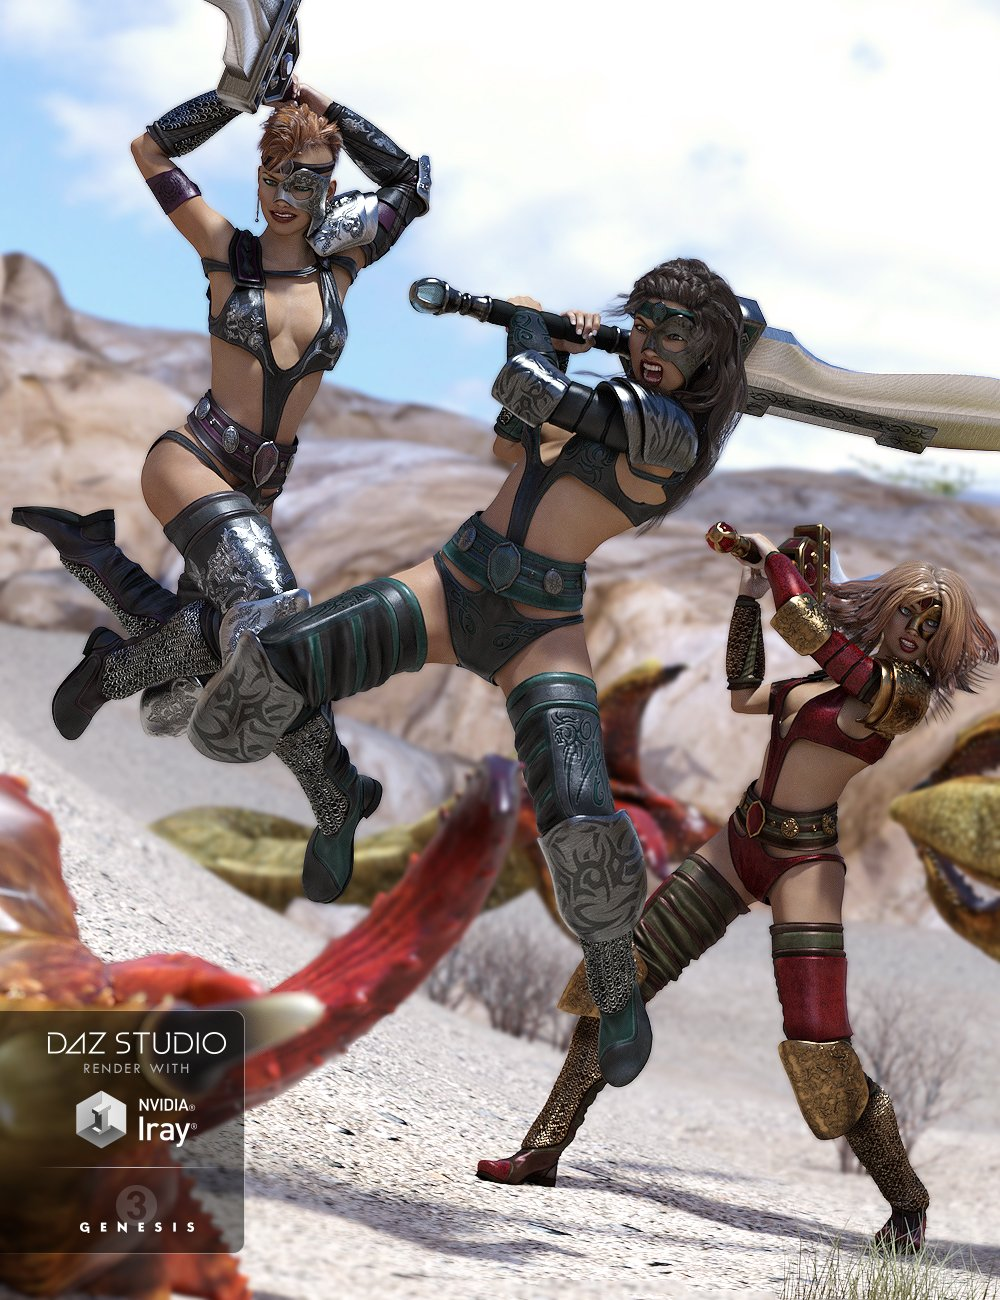 Battle! - 2H Sword Poses by: Daz OriginalsVal3dart, 3D Models by Daz 3D